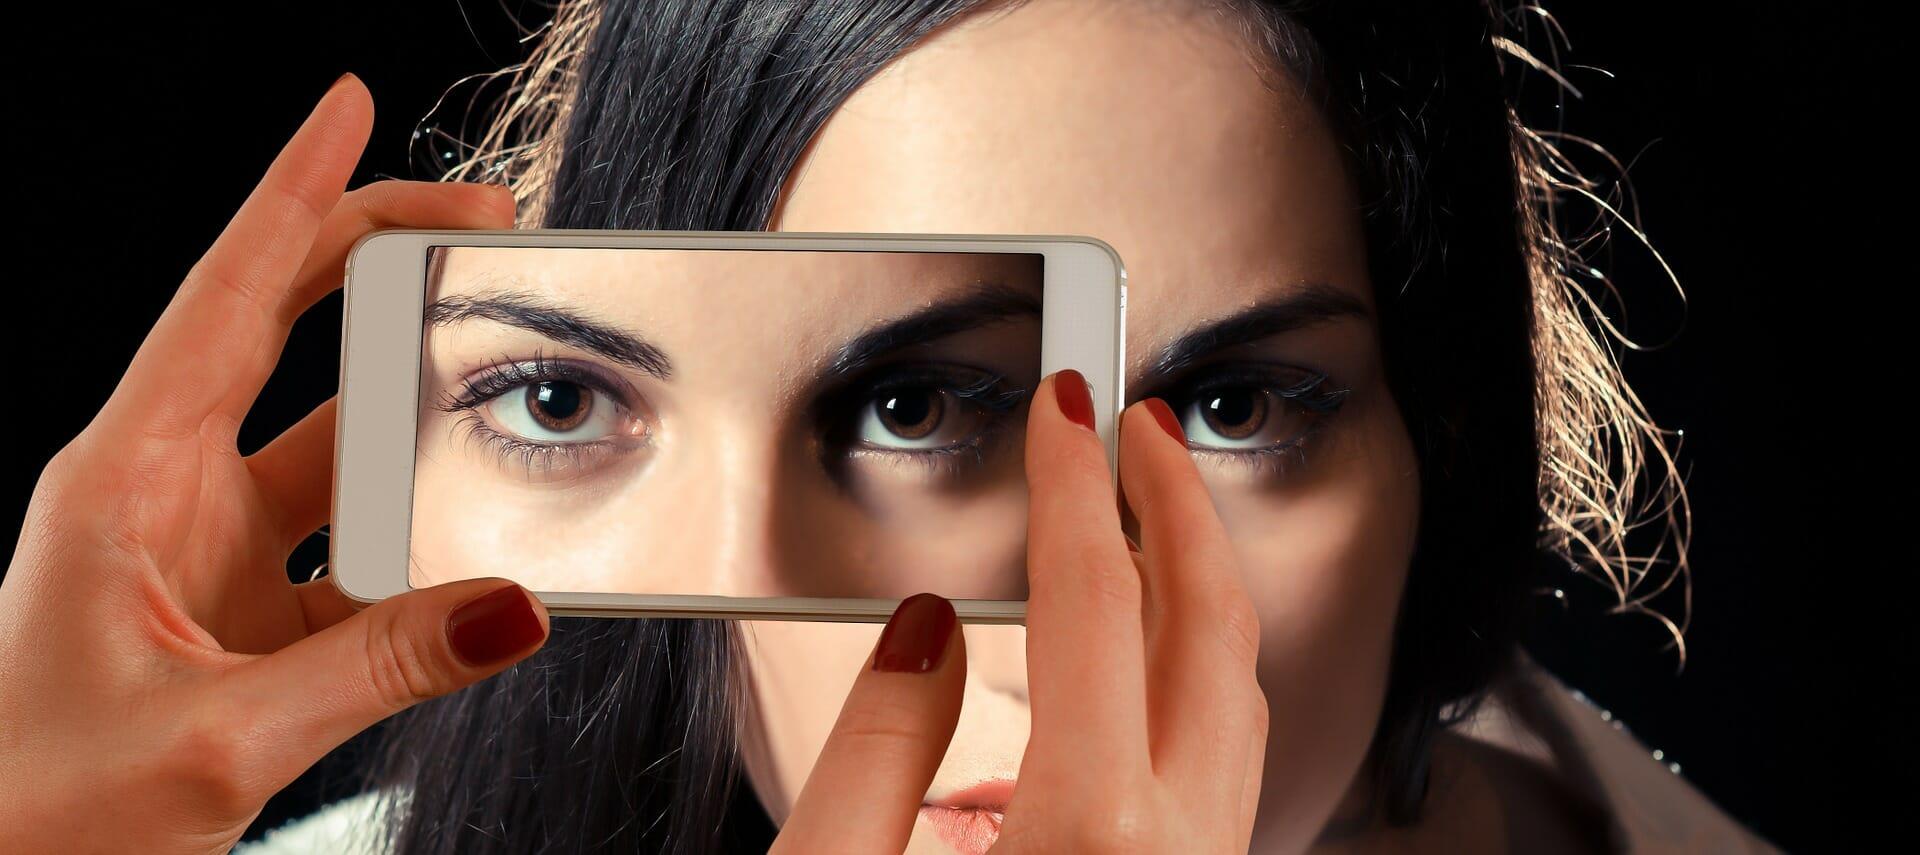 'female gaze' lo sguardo femminile sul mondo